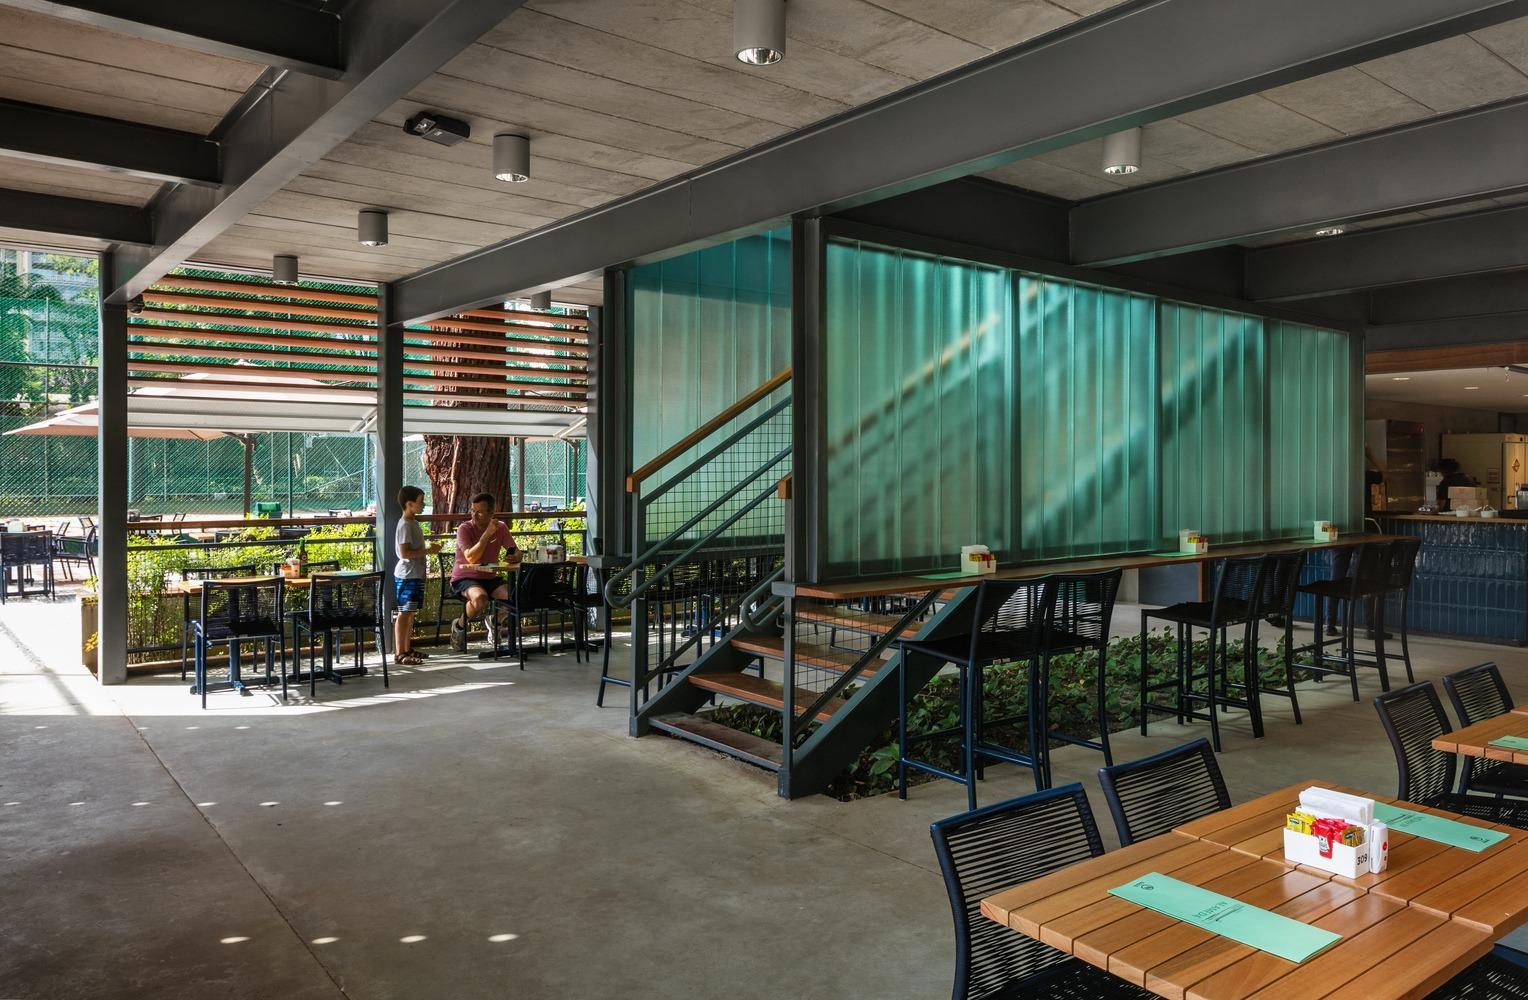 Restaurante Alameda – Esporte Clube Pinheiros / Biselli Katchborian Arquitetos + Zanatta Figueiredo / Nelson Kon